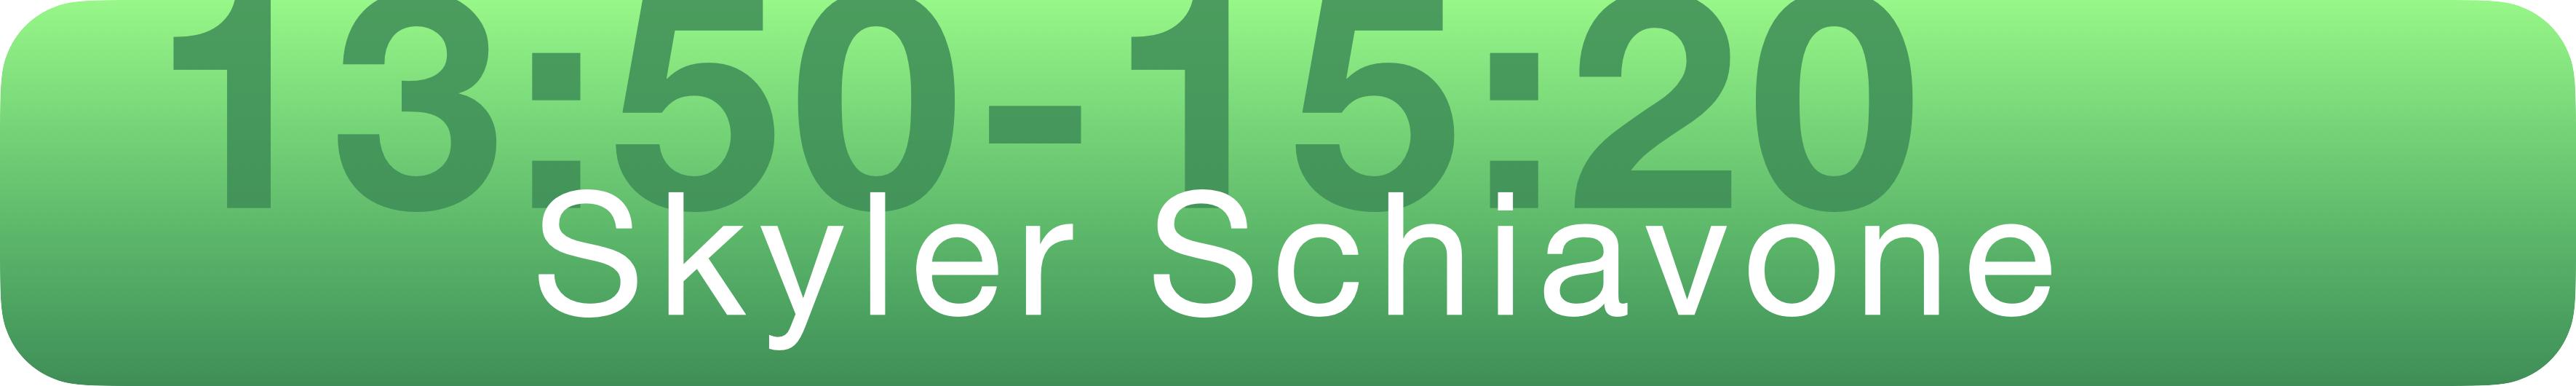 Skyler Schiavone Advising Button 1350